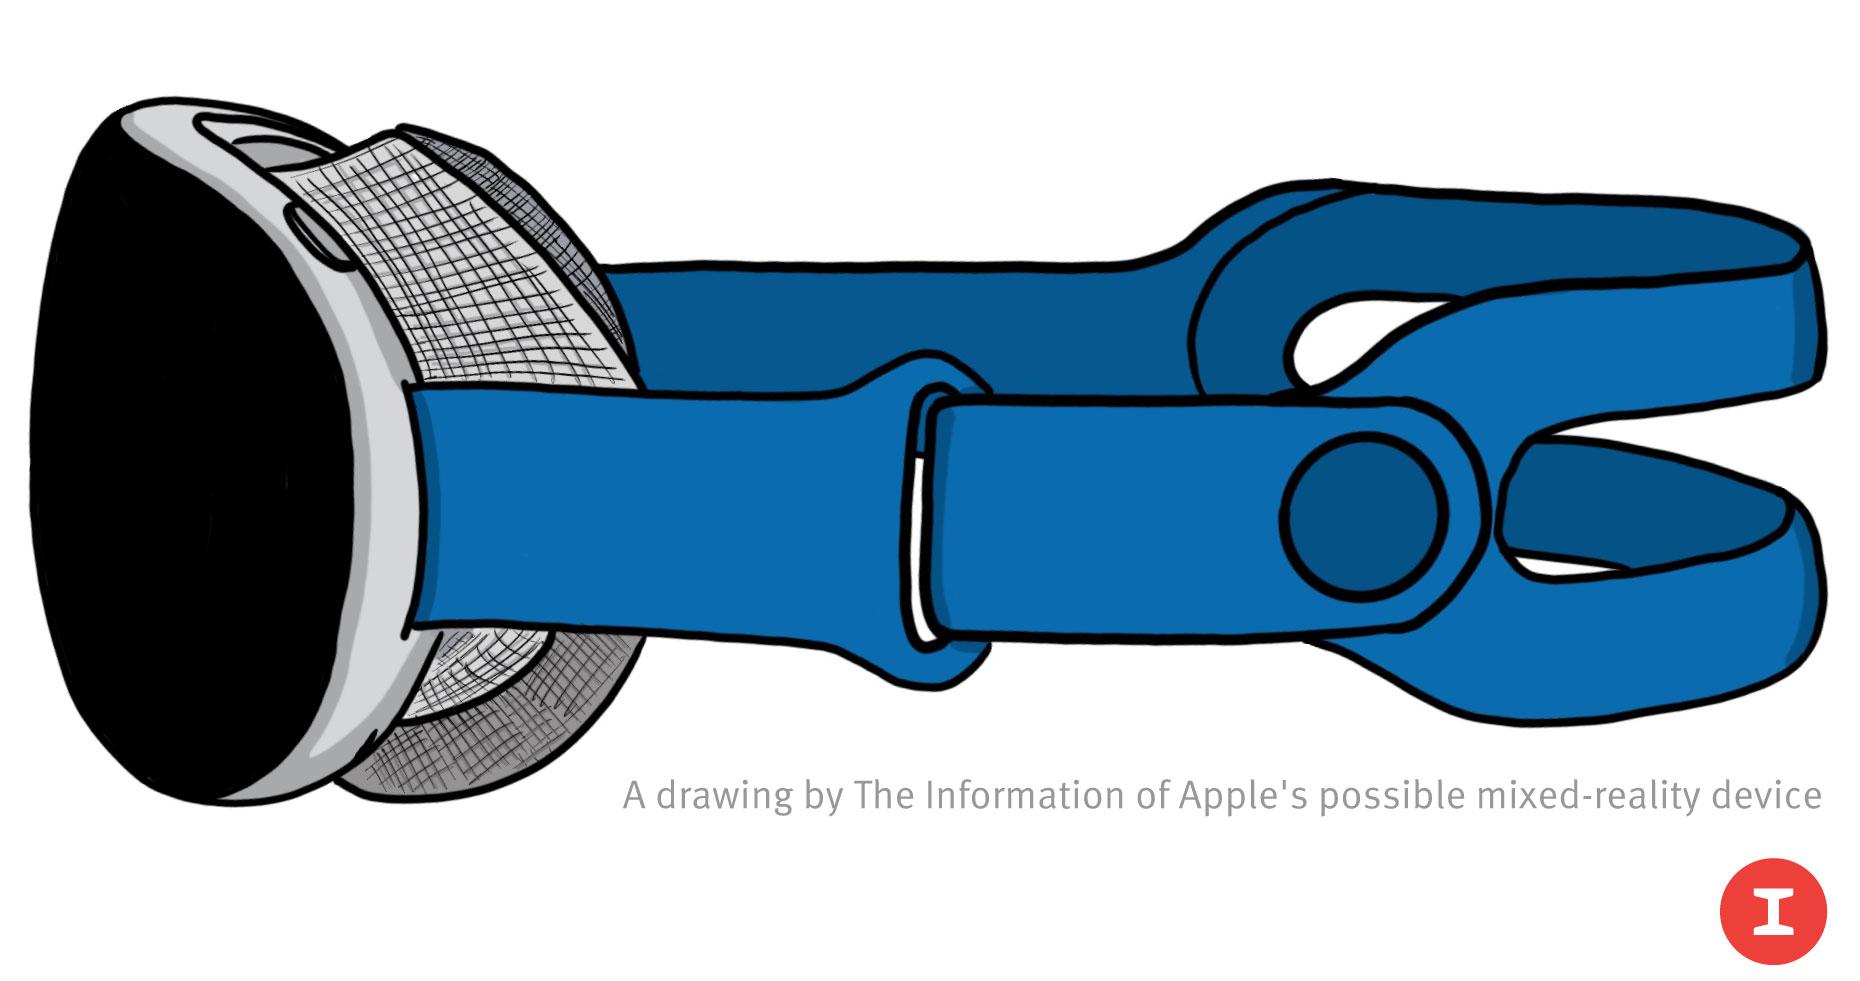 apple mixed reality headset mockup